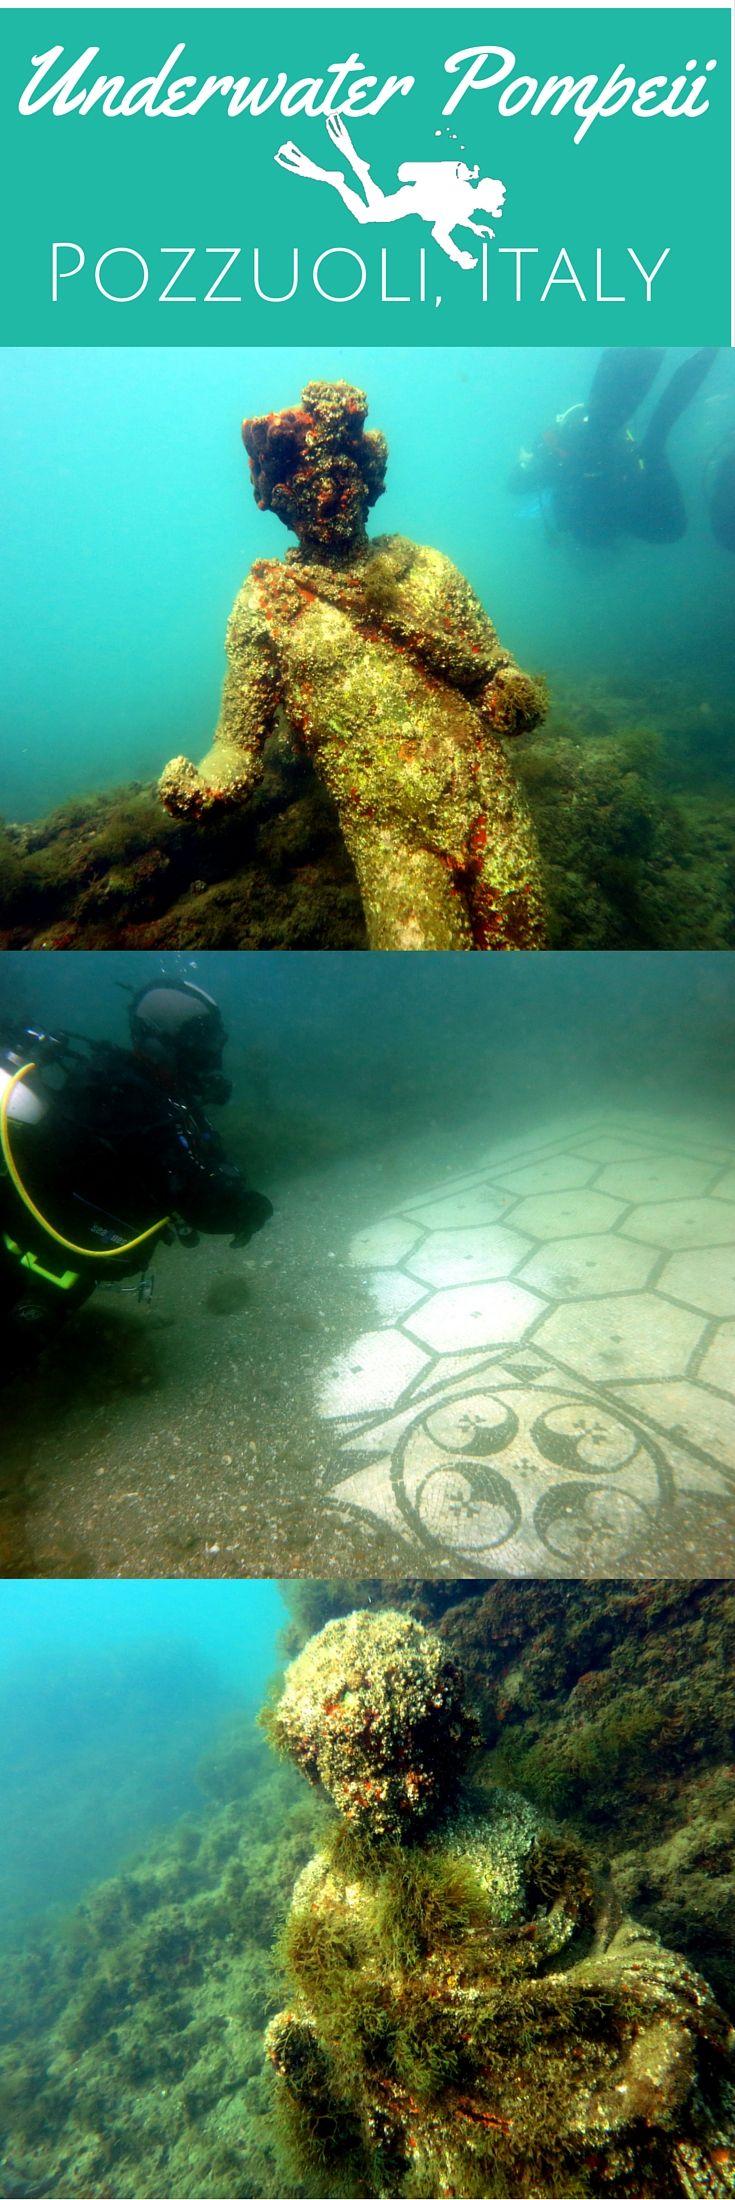 Dive in history underwater pompeii in pozzuoli italy for Porno dive italia